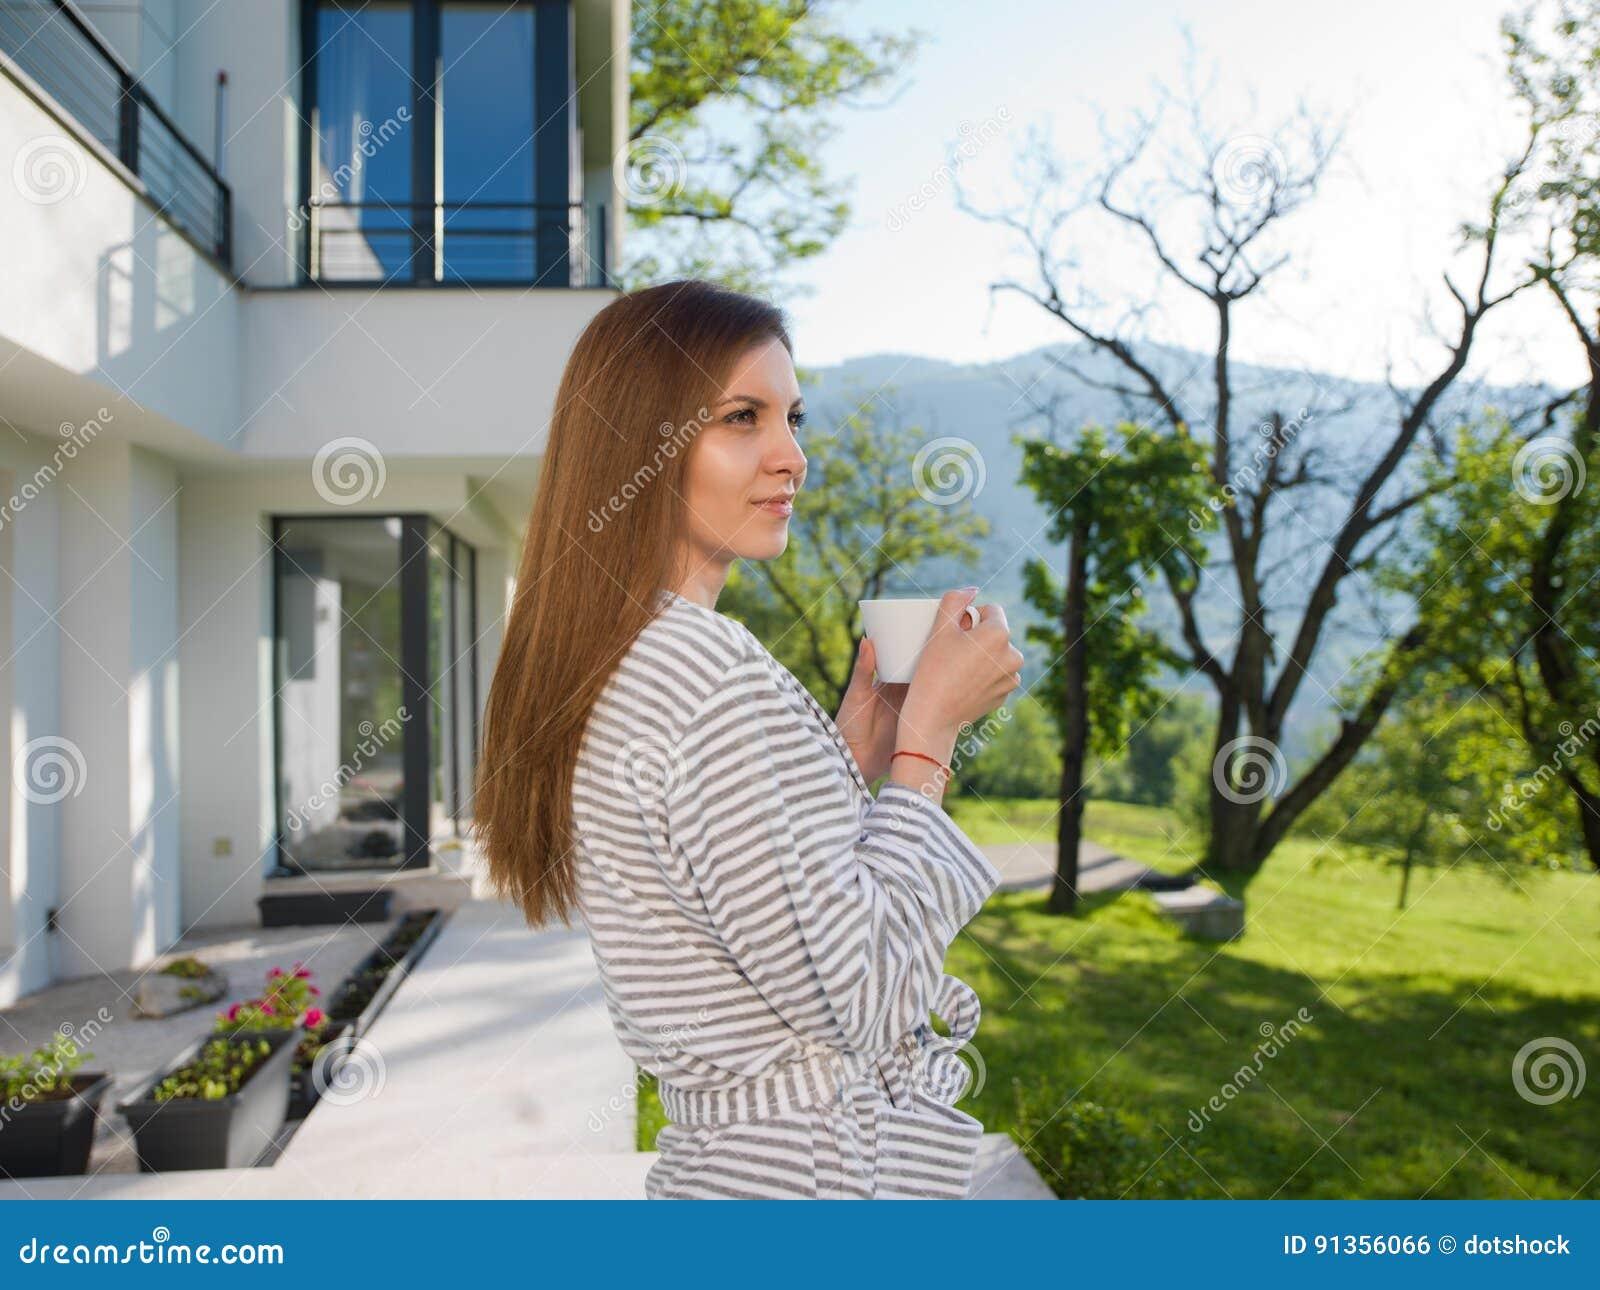 Woman In A Bathrobe Enjoying Morning Coffee Stock Photo ...